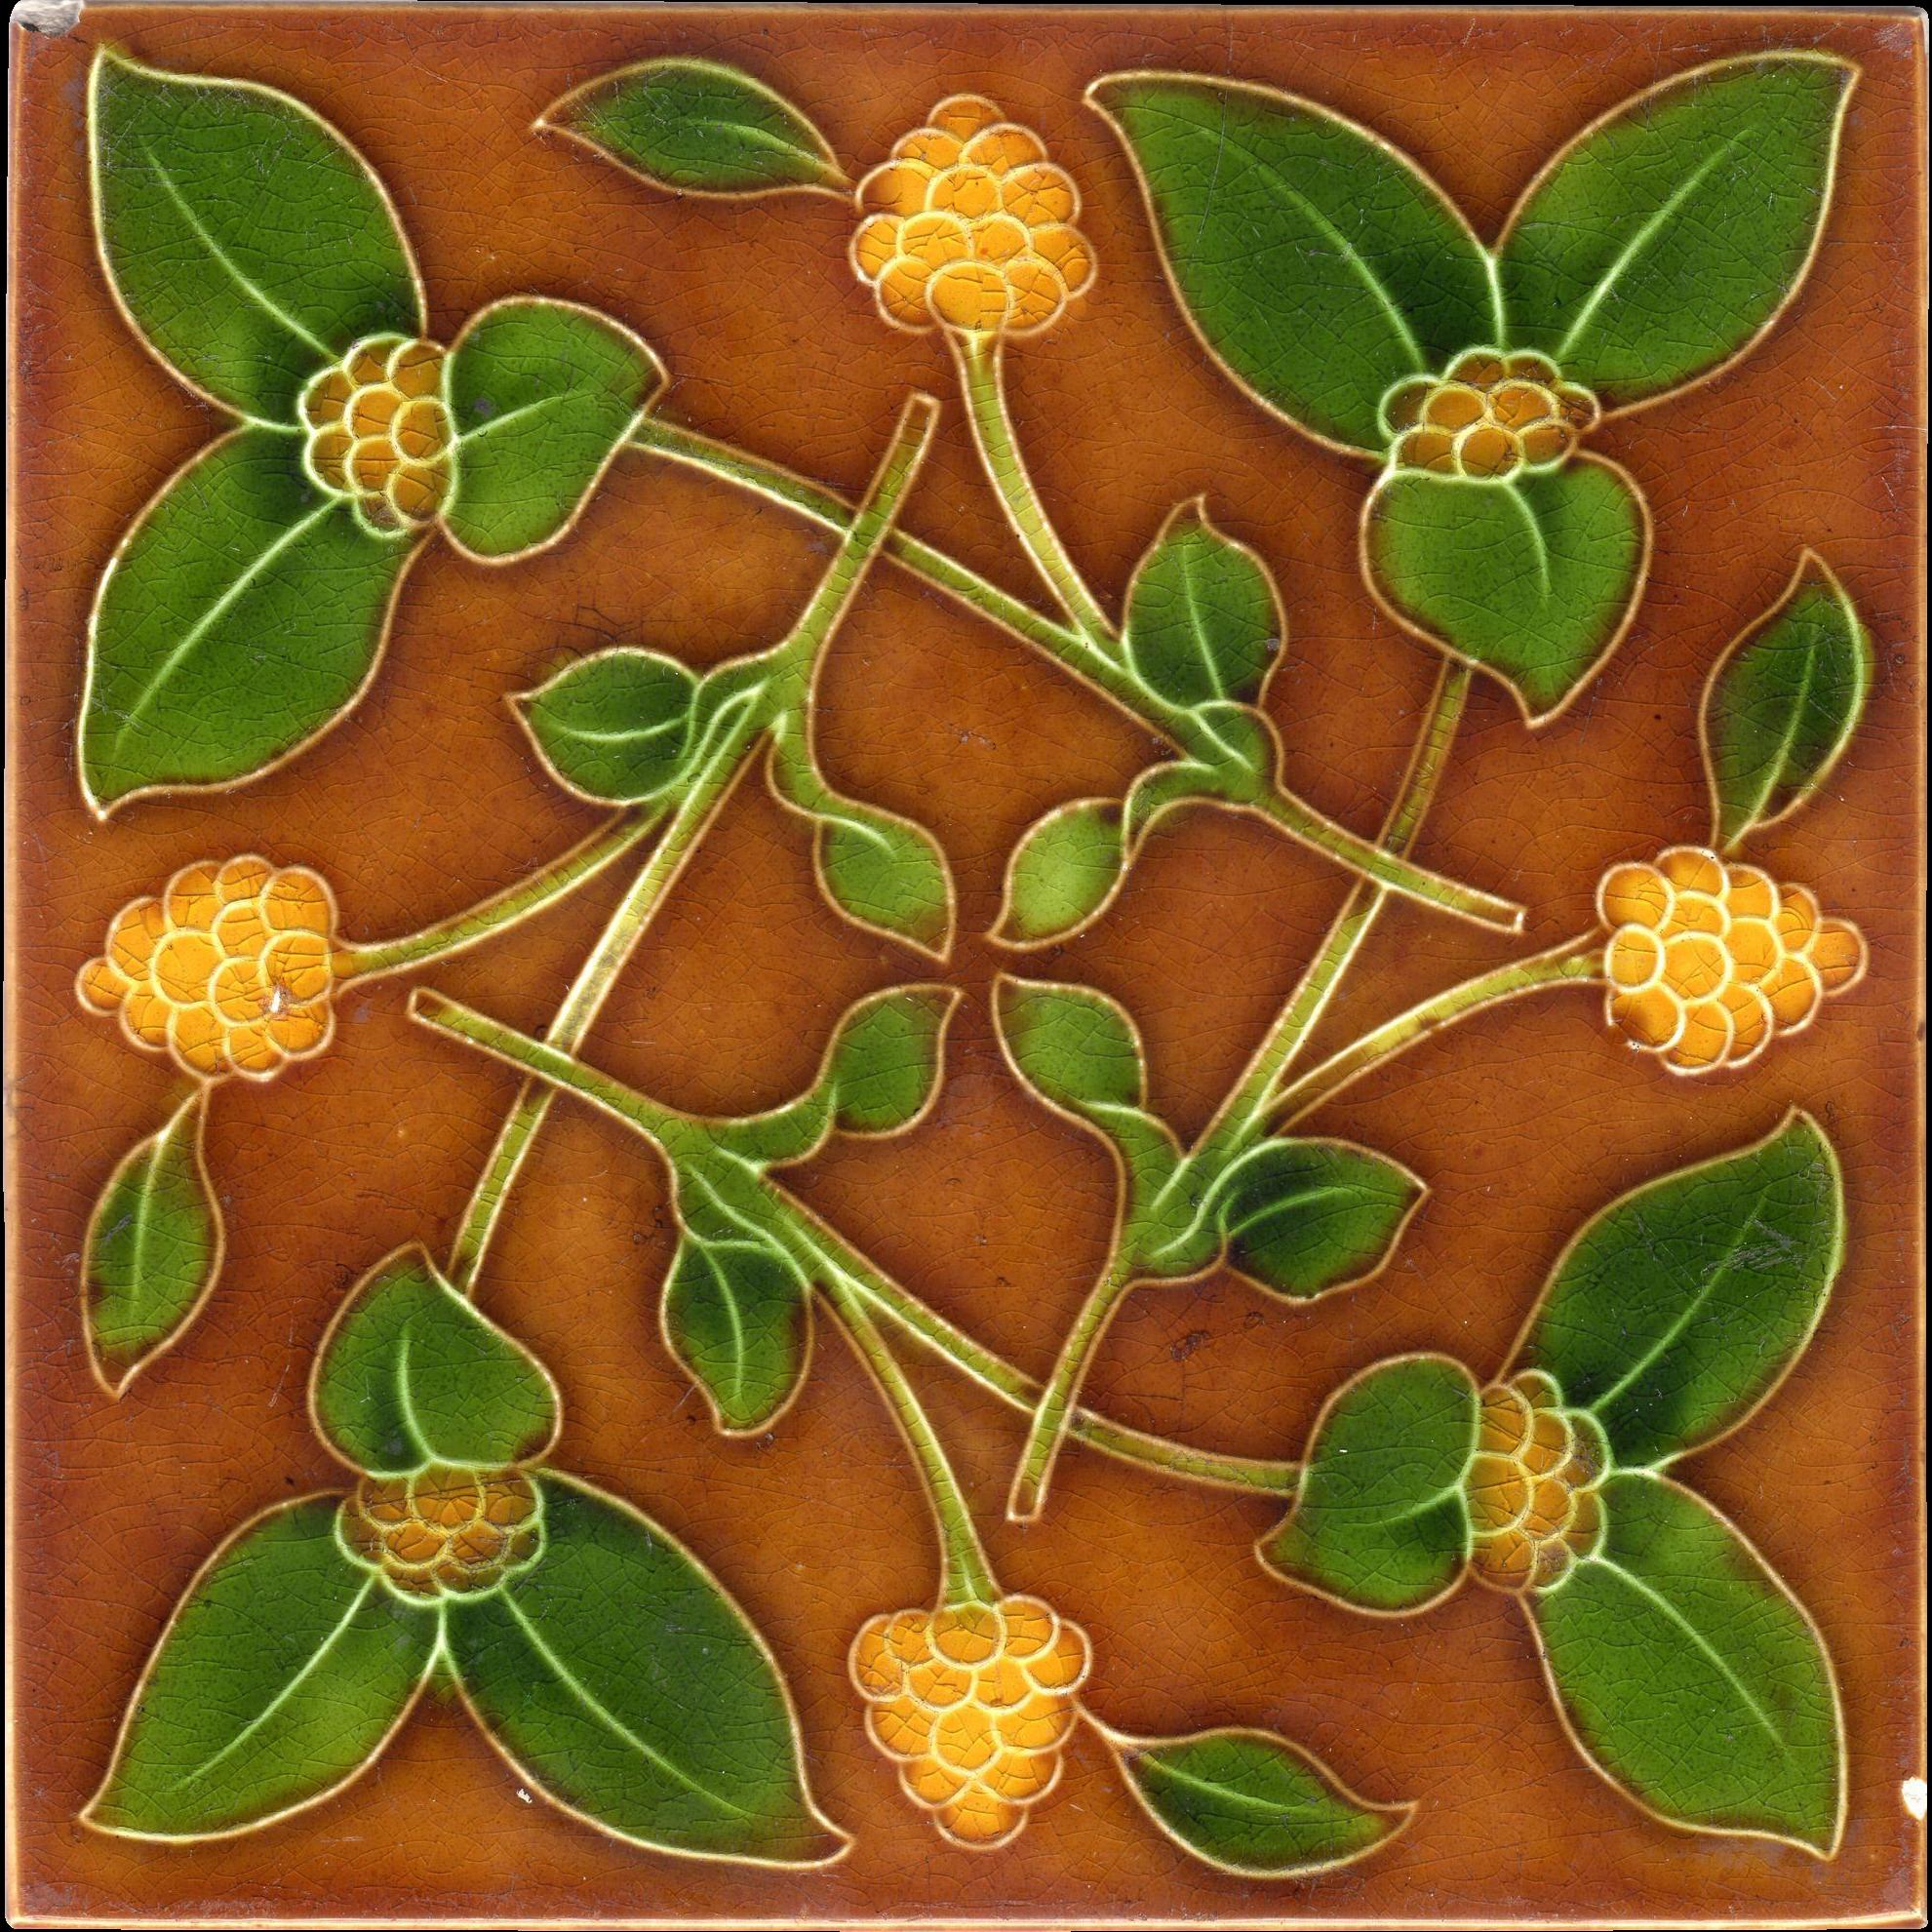 Enhance Your Bathroom Using Ceramic Tiles With Images Ceramic Tile Art Art Deco Tiles